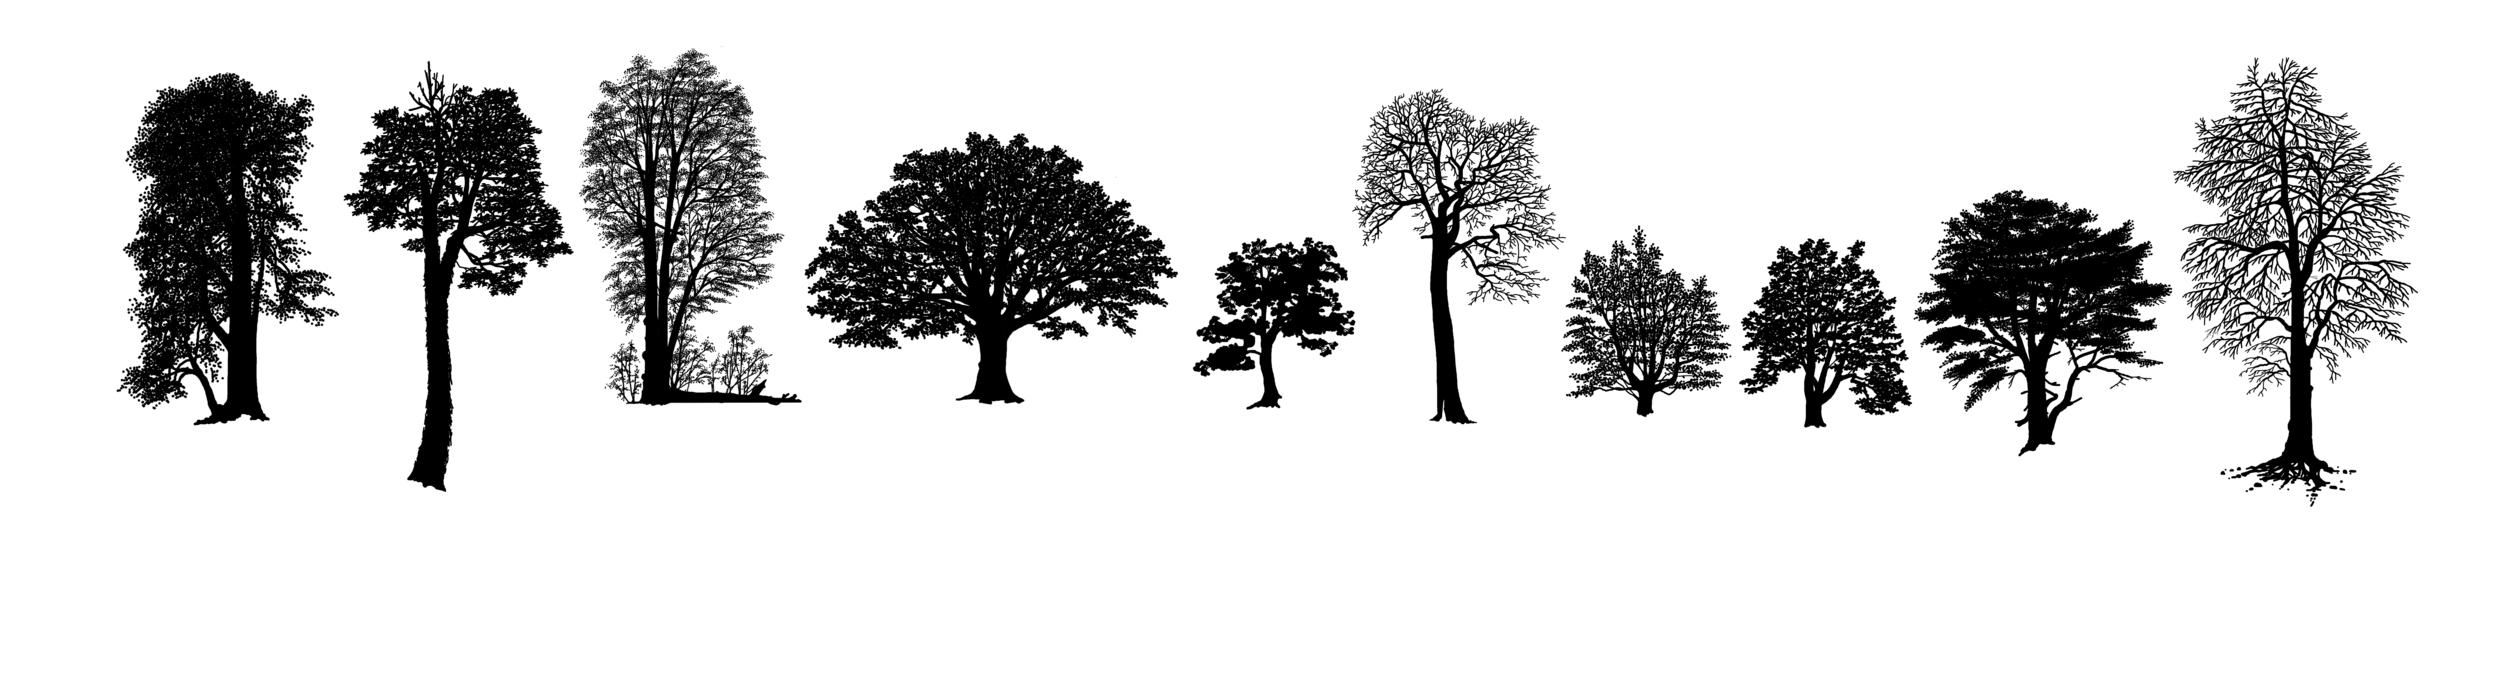 hoyt trees angiosperm2.png